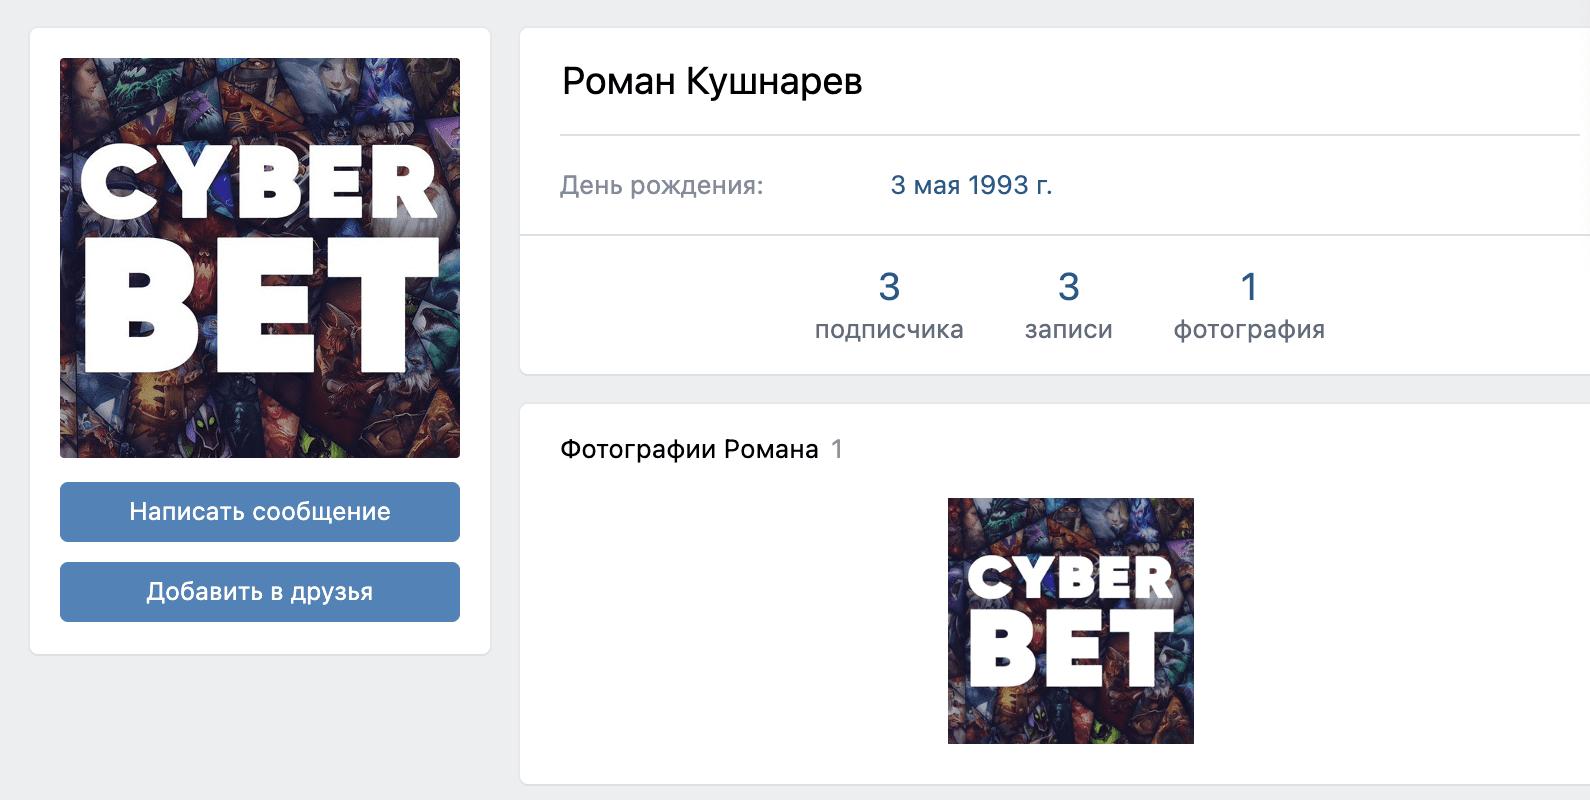 Страница ВК Cyberbet(Cyber bet)